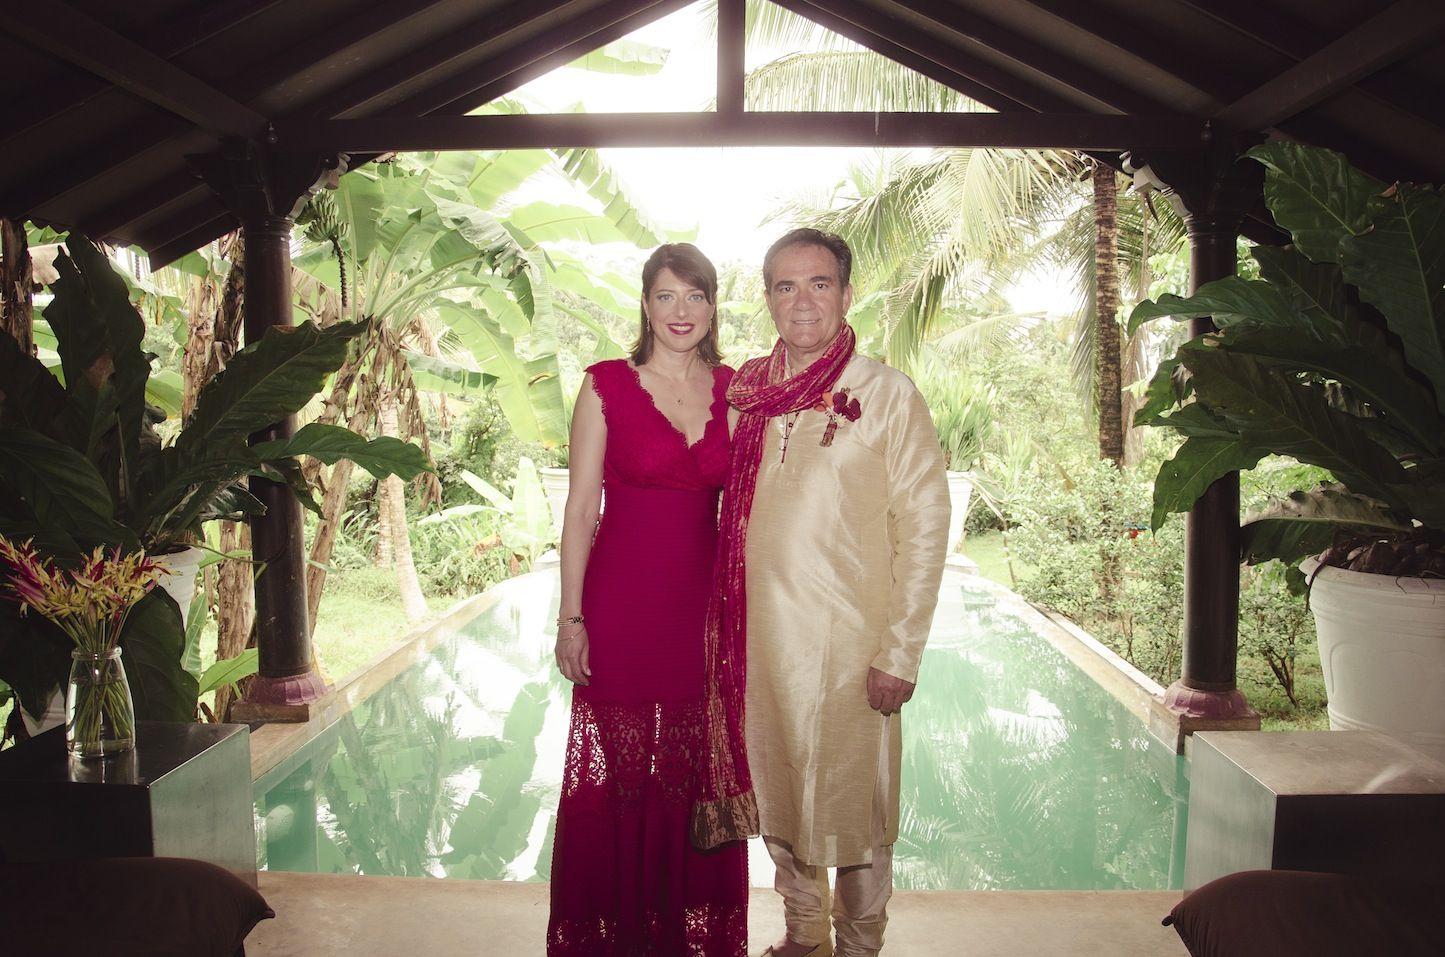 Summer Wedding in Sri Lanka Paradise. Intimate weddings at Casa Heliconia.  http://www.casa-heliconia.com/weddings  #WeddingsinSriLanka #LocationWeddings #WeddingHotelsSriLanka